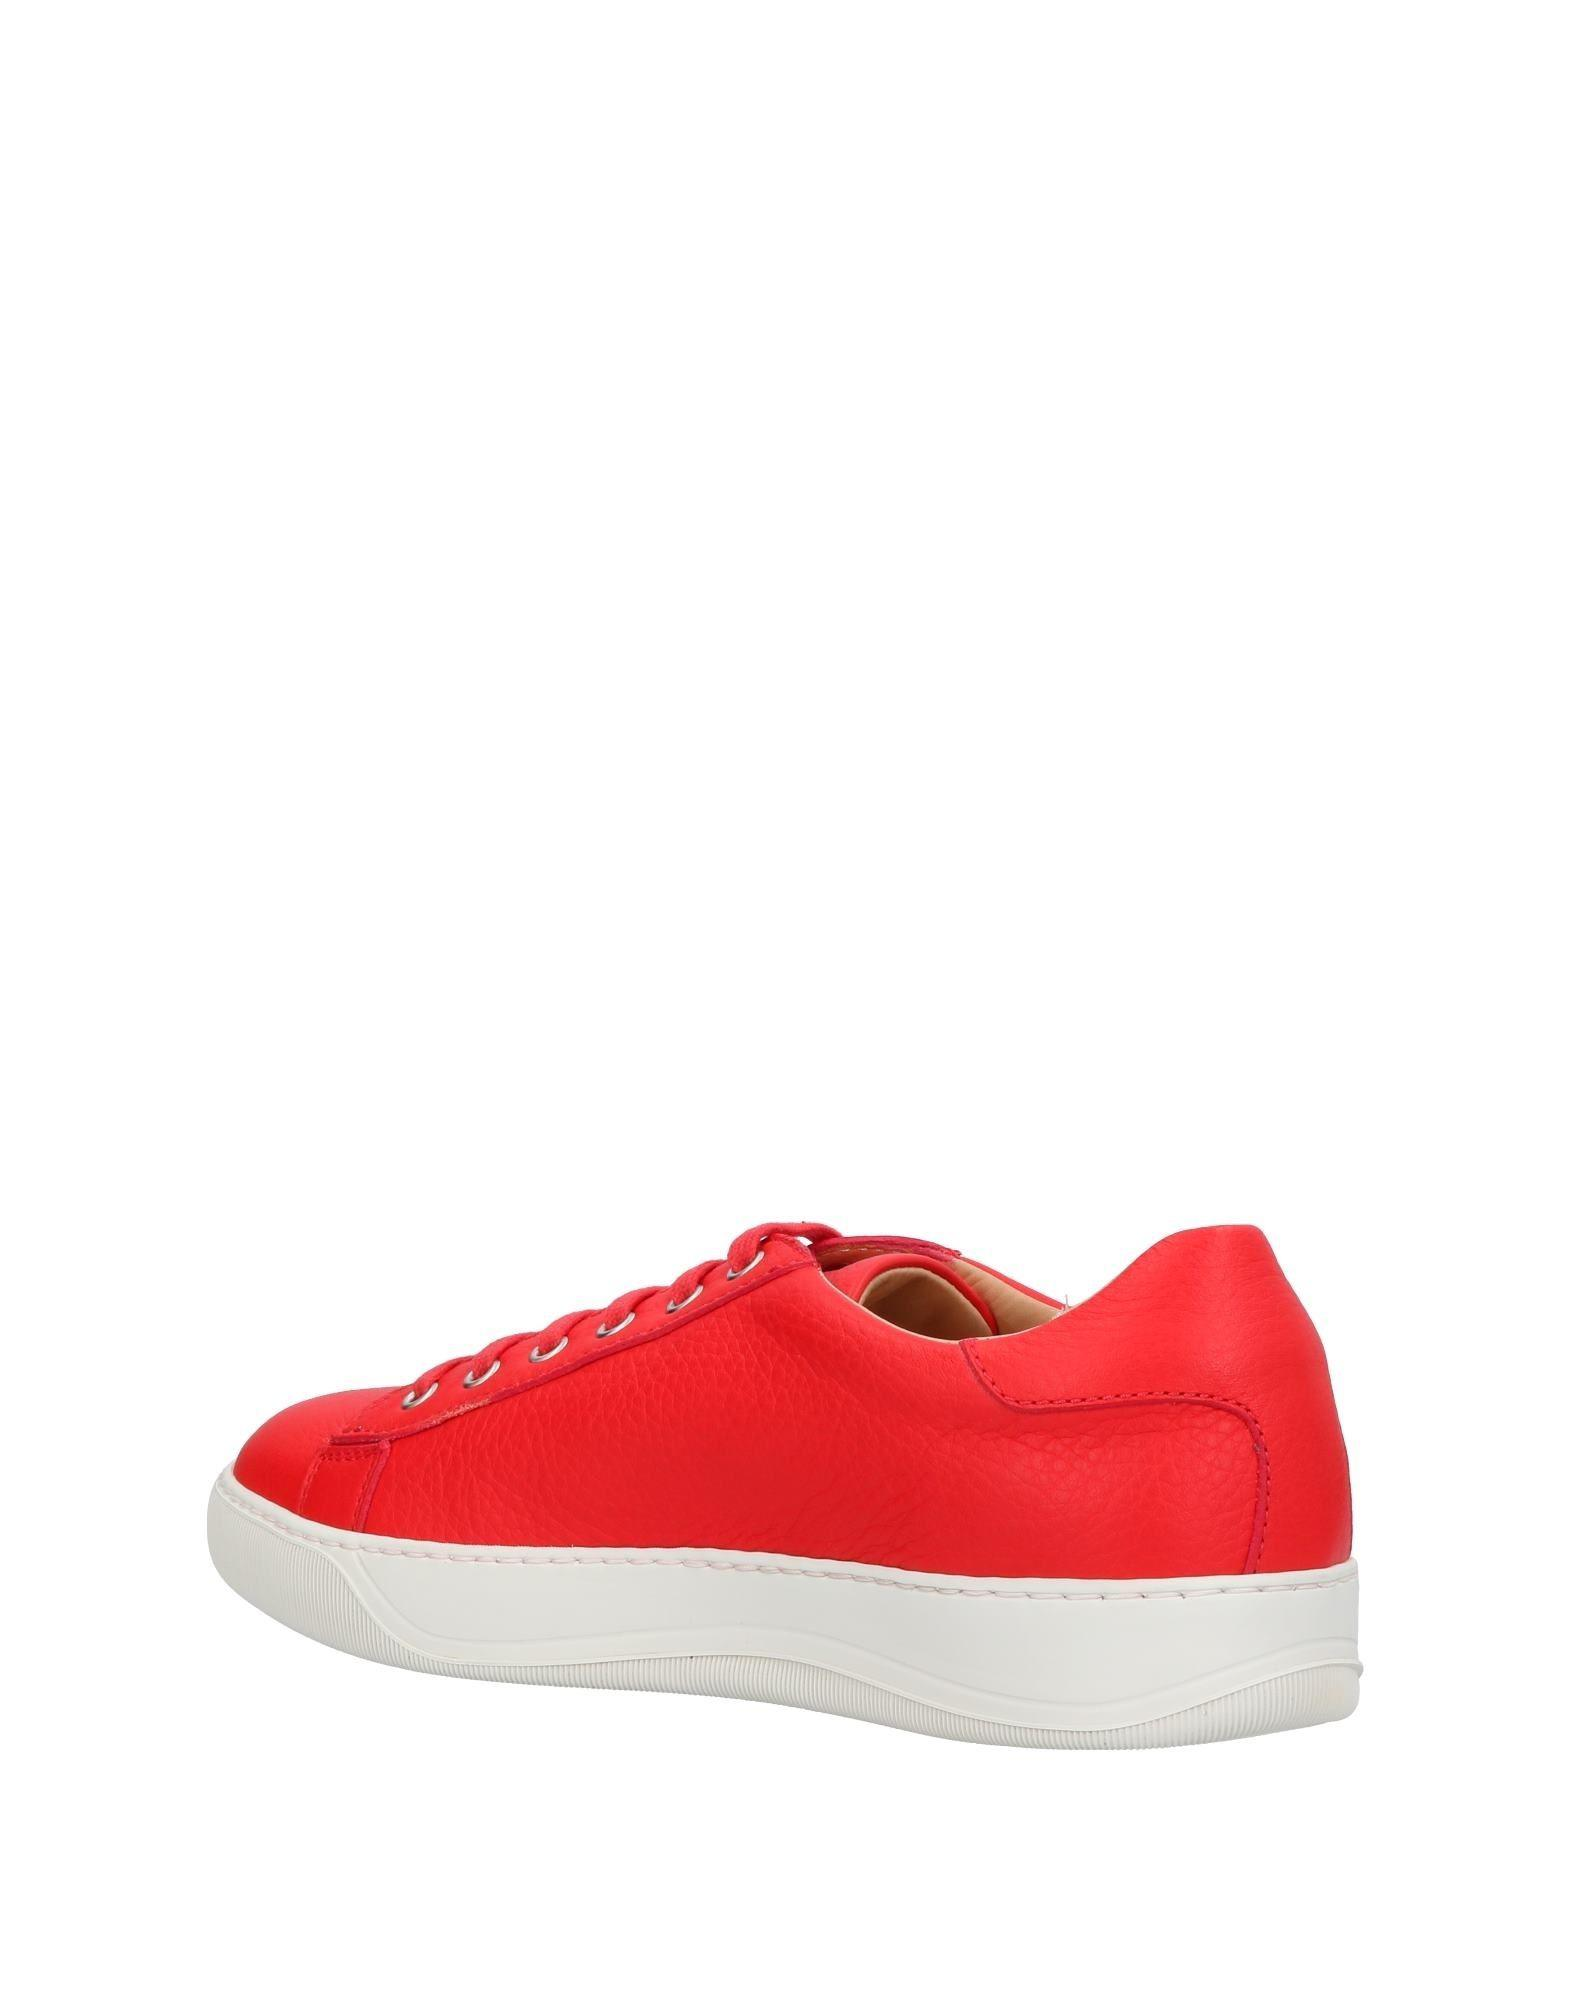 reputable site 4b810 0ceec santoni-Red-Low-tops-Sneakers.jpeg